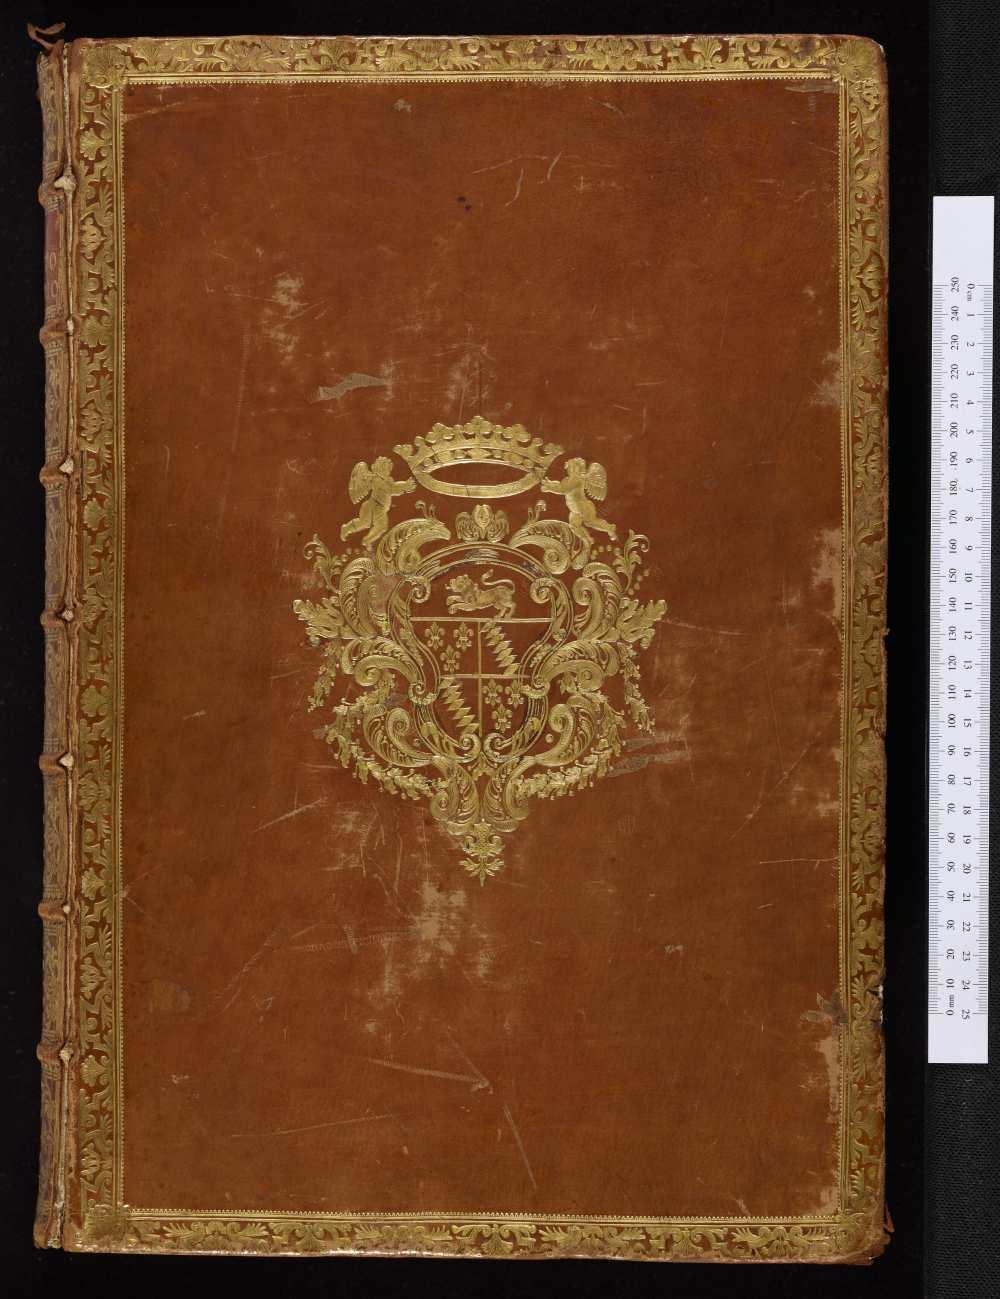 Bodleian Library Auct. 2Q 1.11. A kép forrása: Bodleian Libraries, University of Oxford https://digital.bodleian.ox.ac.uk/objects/1ba80701-8b5b-4fc9-9252-b6101c99e791/surfaces/c8de859d-af16-454b-bb8c-33044ba27950/